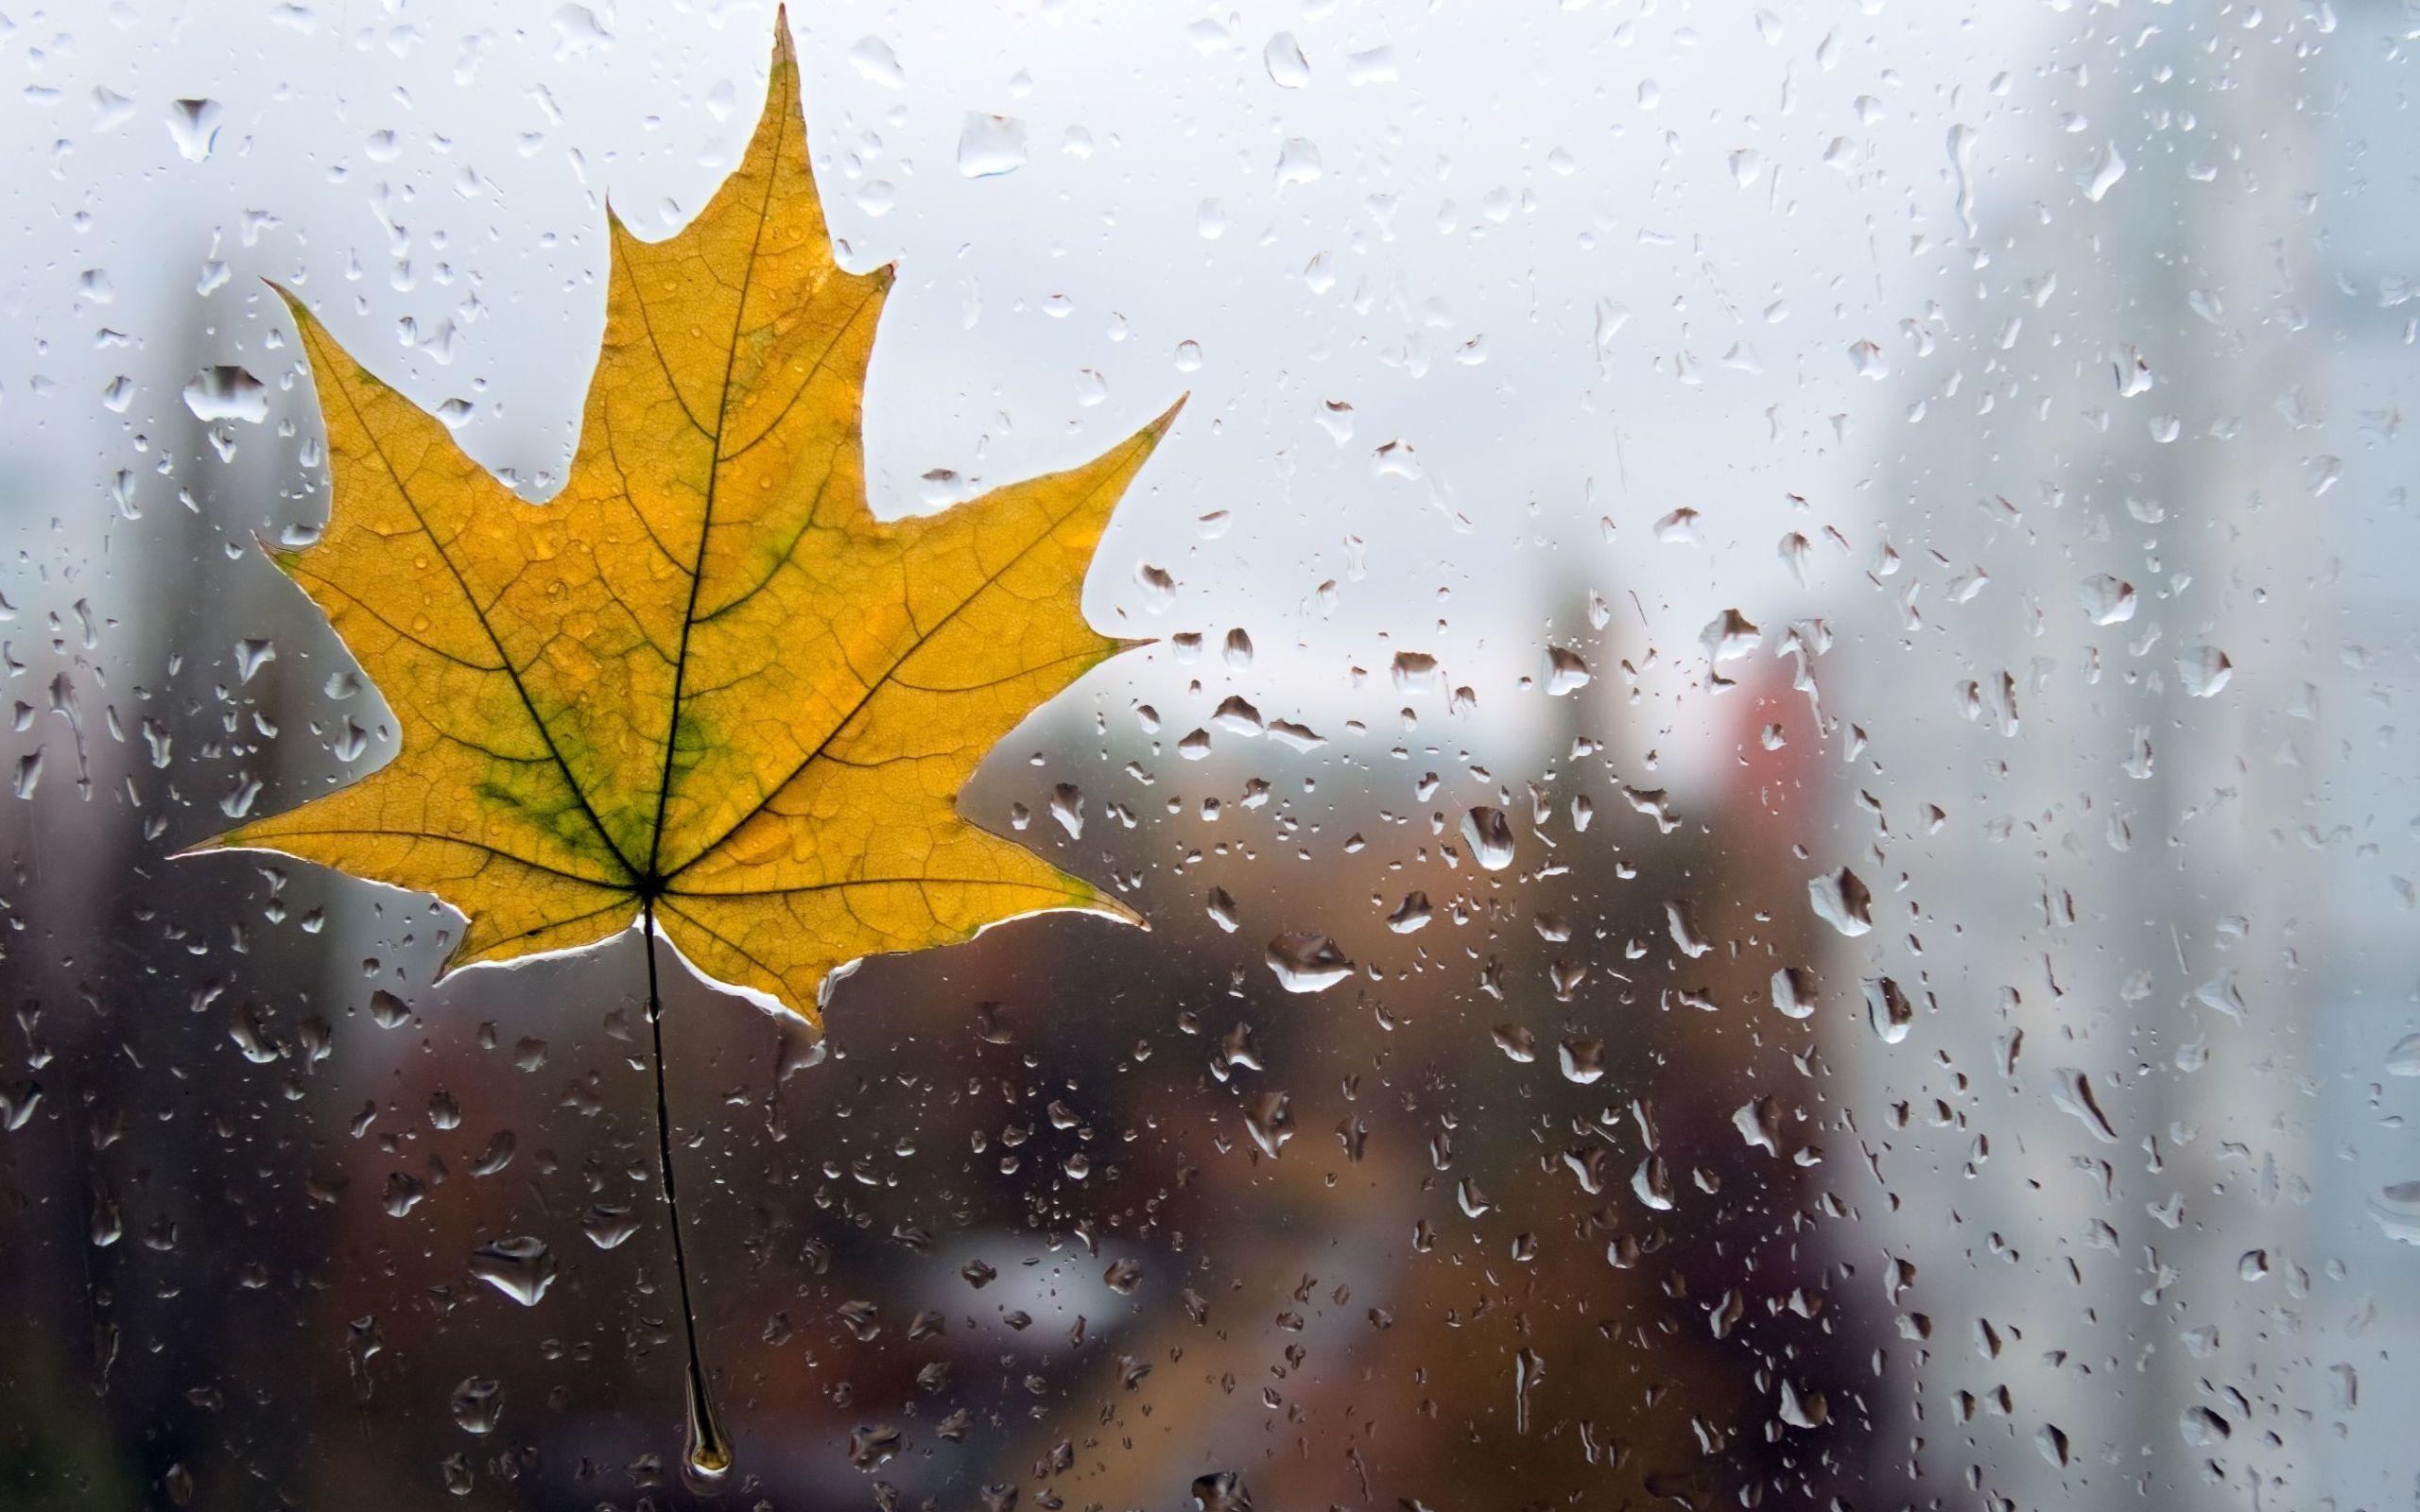 Download Wallpaper Glass Widescreen Leaf Leaves Hd